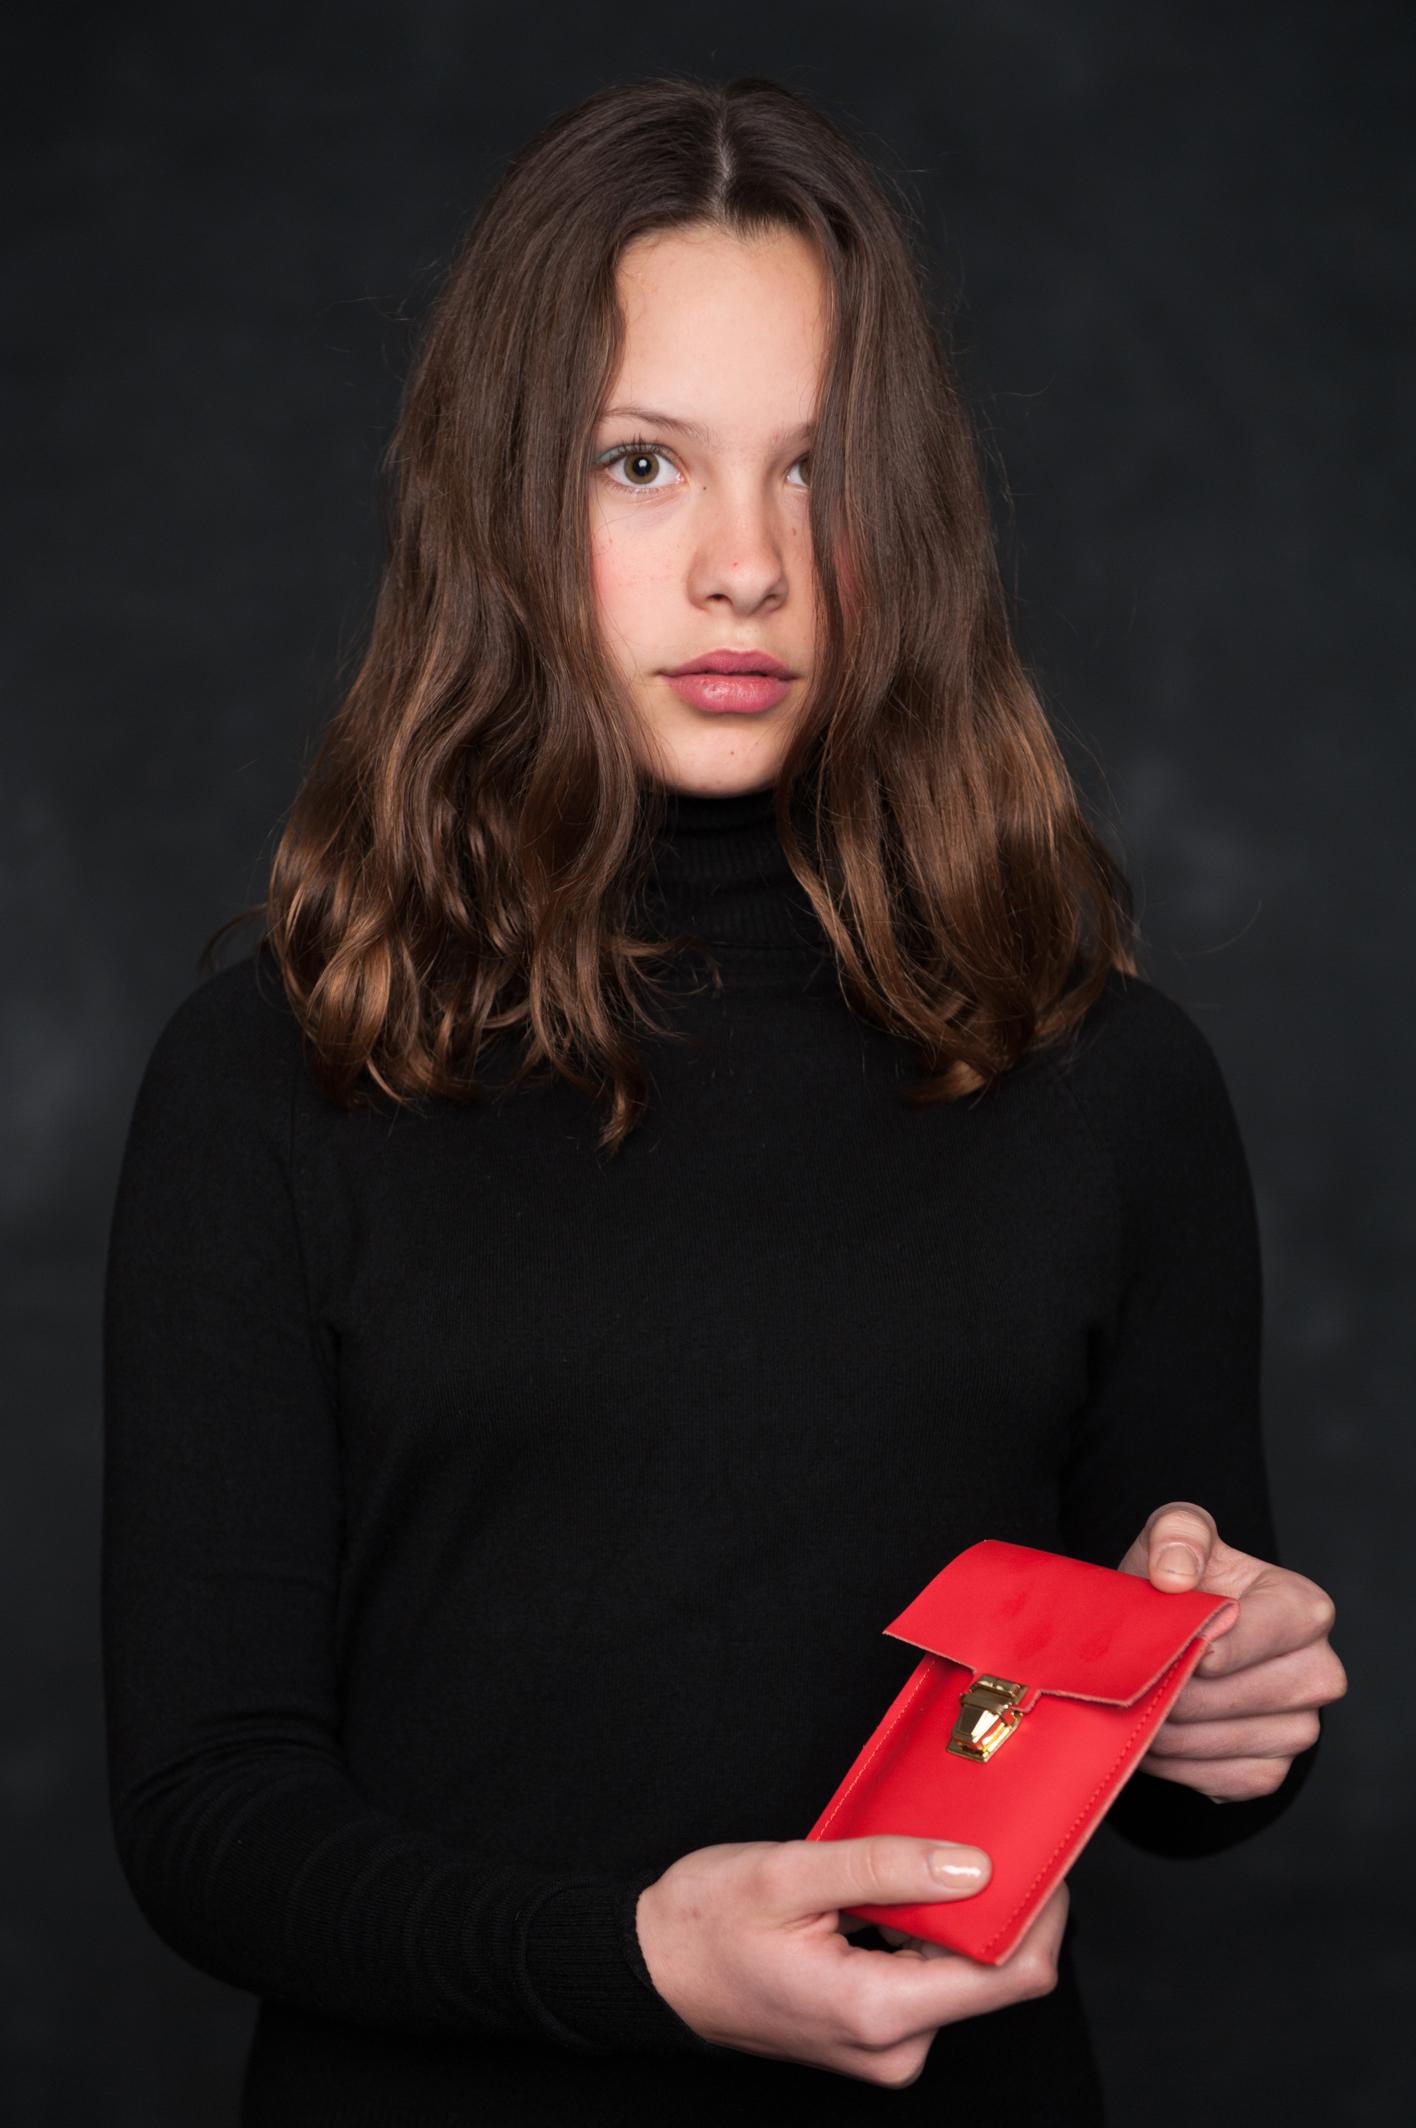 06-EmmaPardos.jpg